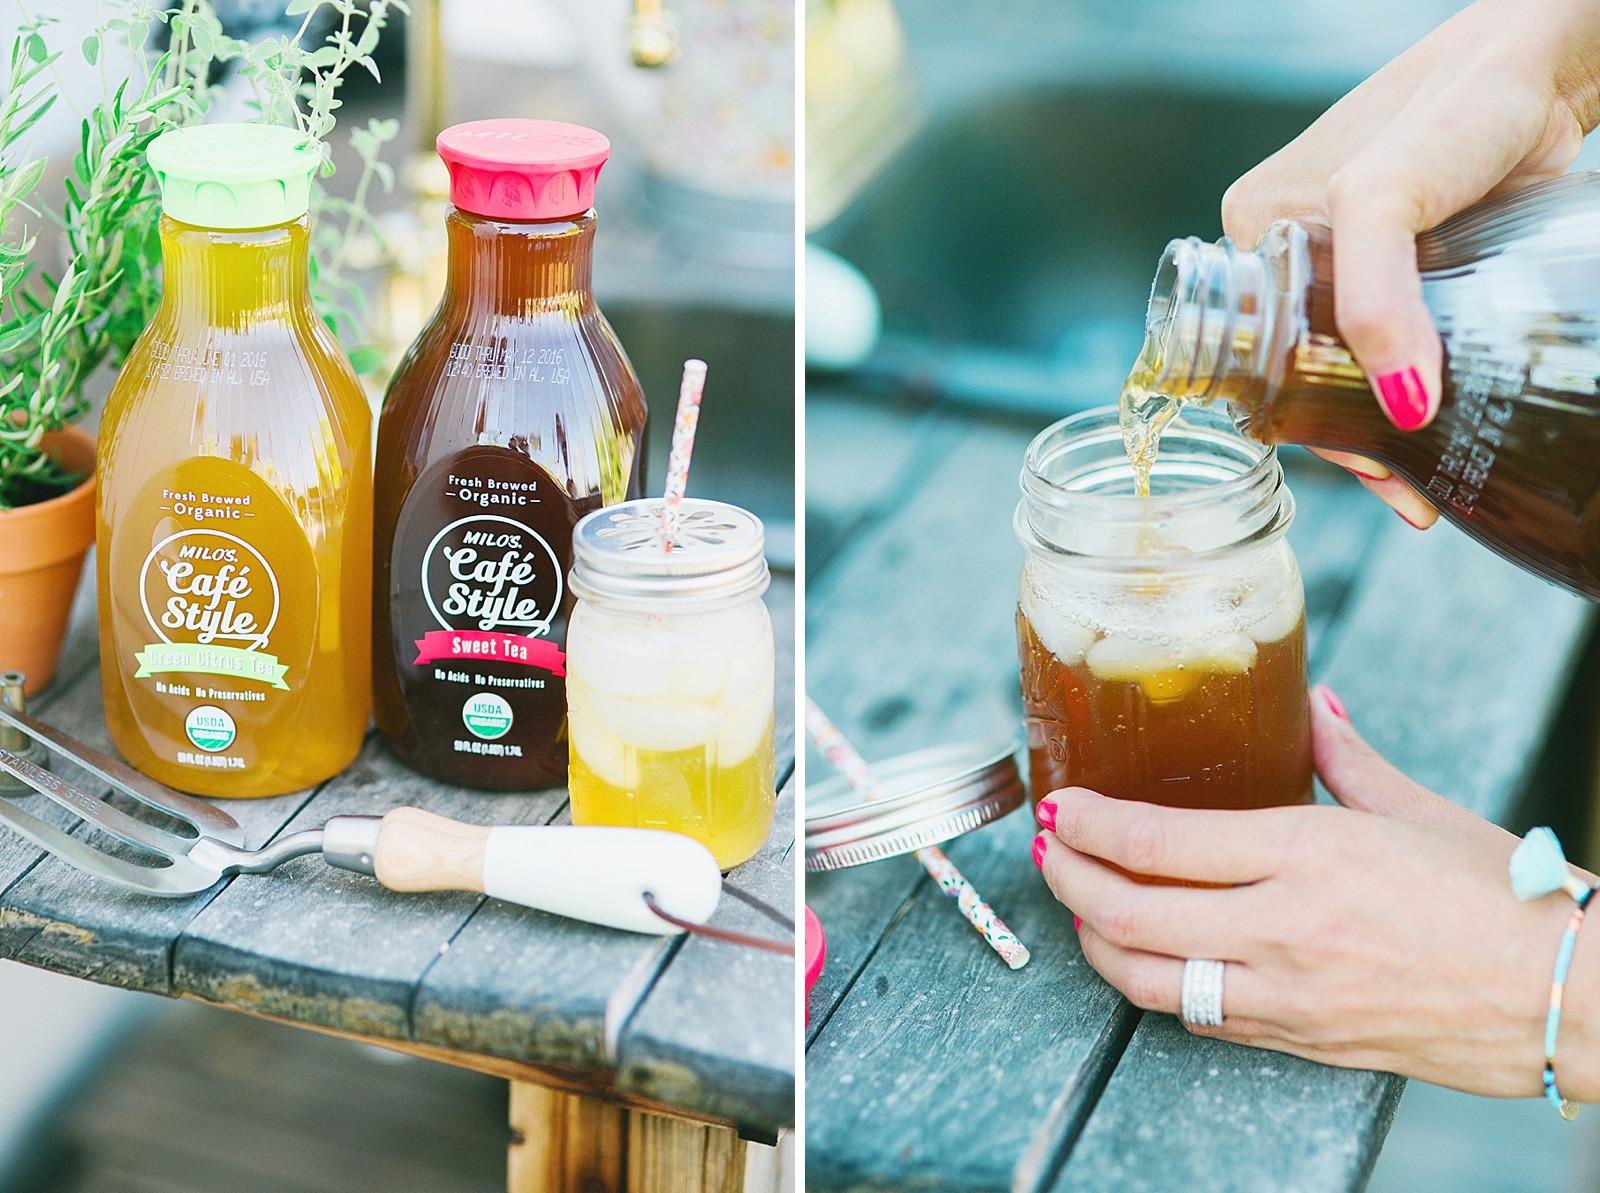 milo-iced-tea-gardening-lifestyle-blogger-diana-elizabeth-blog_0052